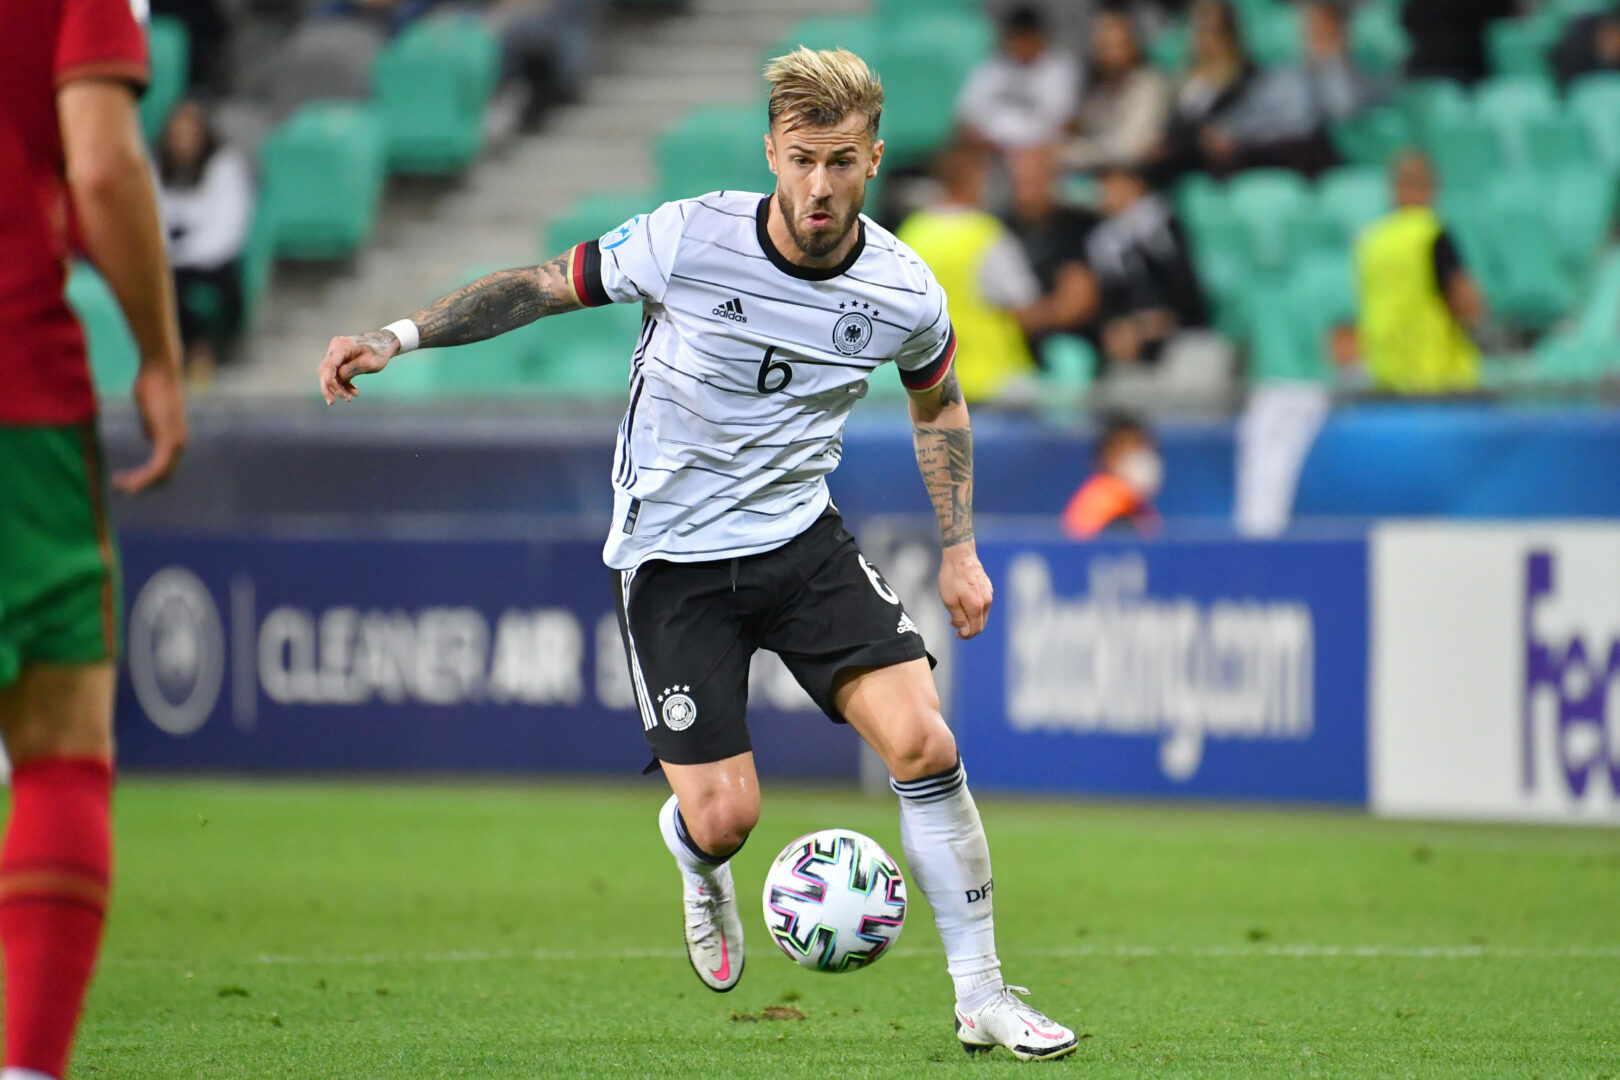 FC Augsburg: Weinzierl bestätigt großes Interesse an Niklas Dorsch